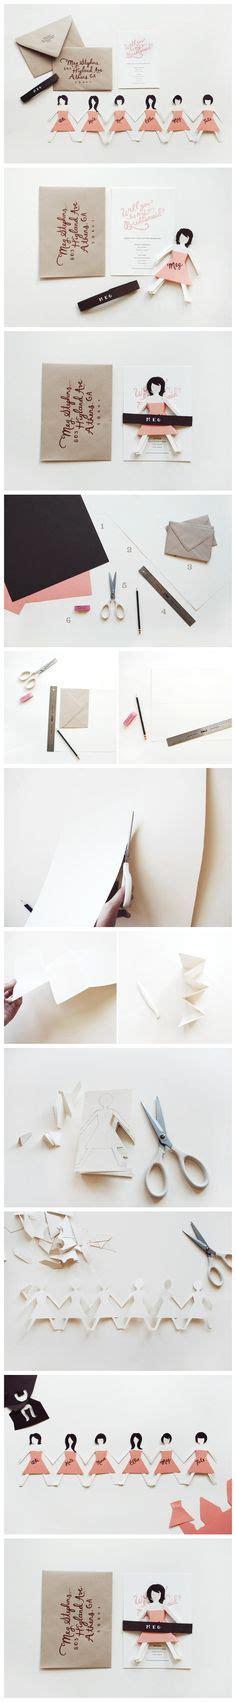 handmade invitations images handmade invitations